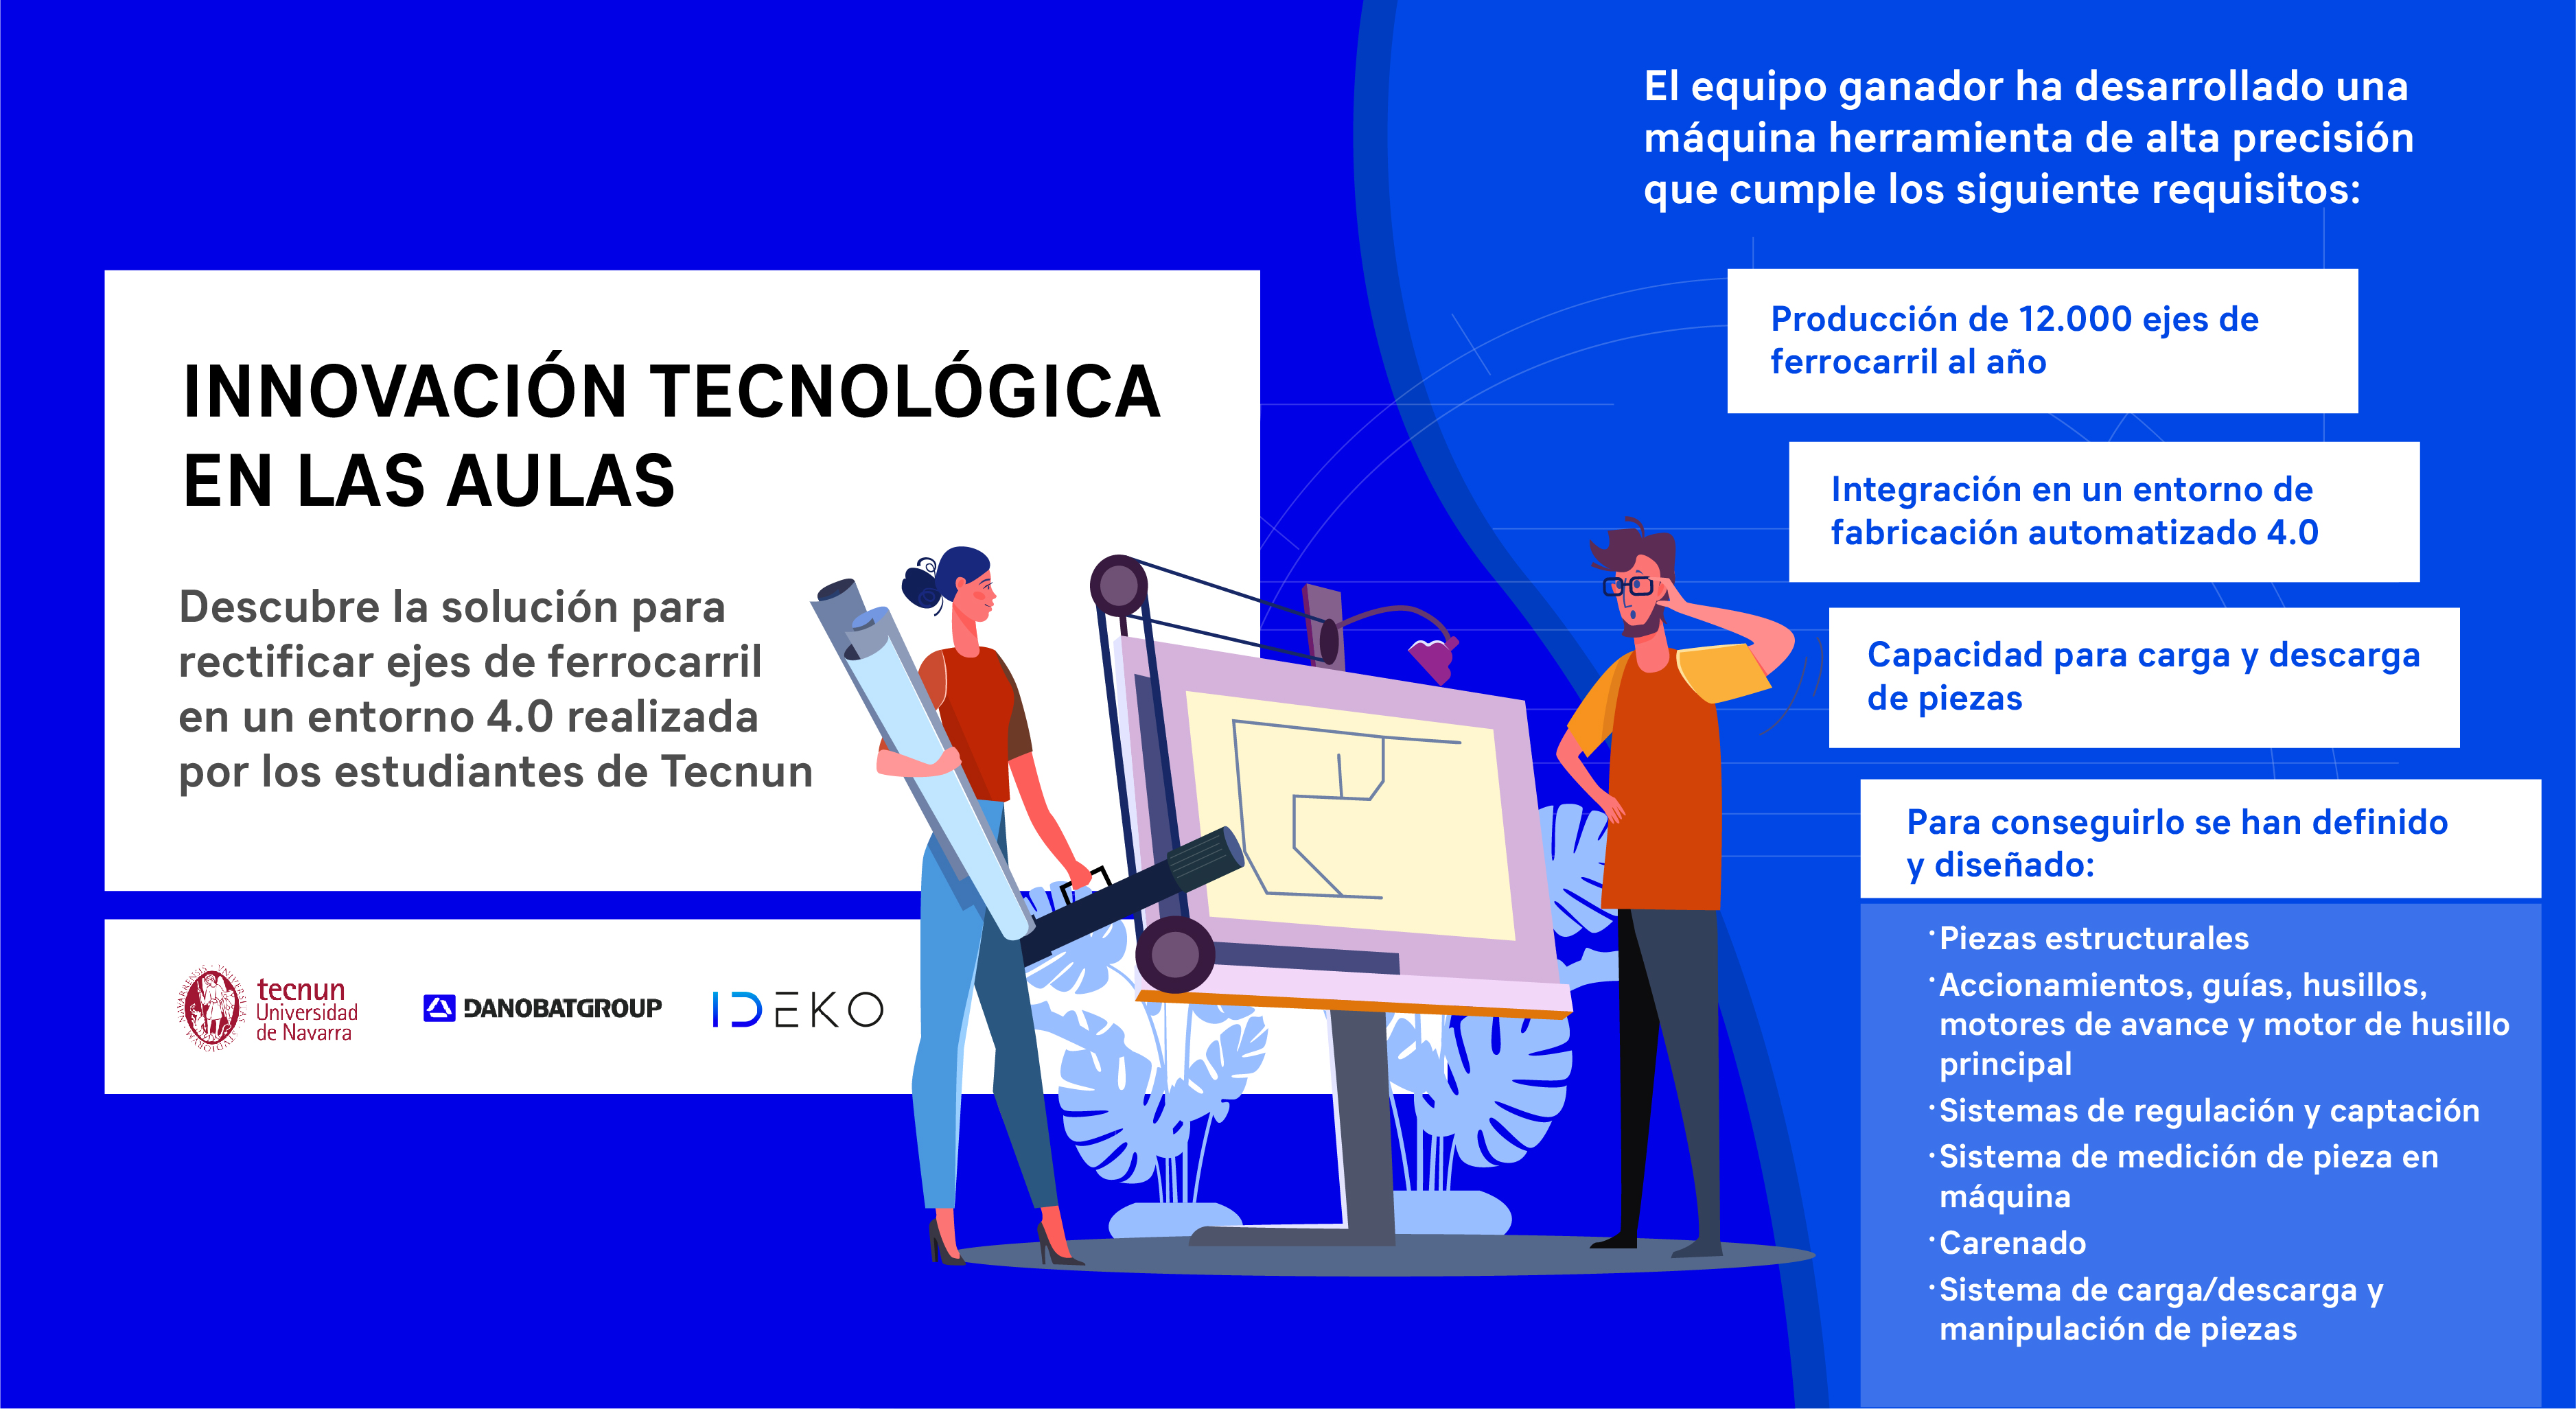 Infografía premios Tecnun Danobatgroup